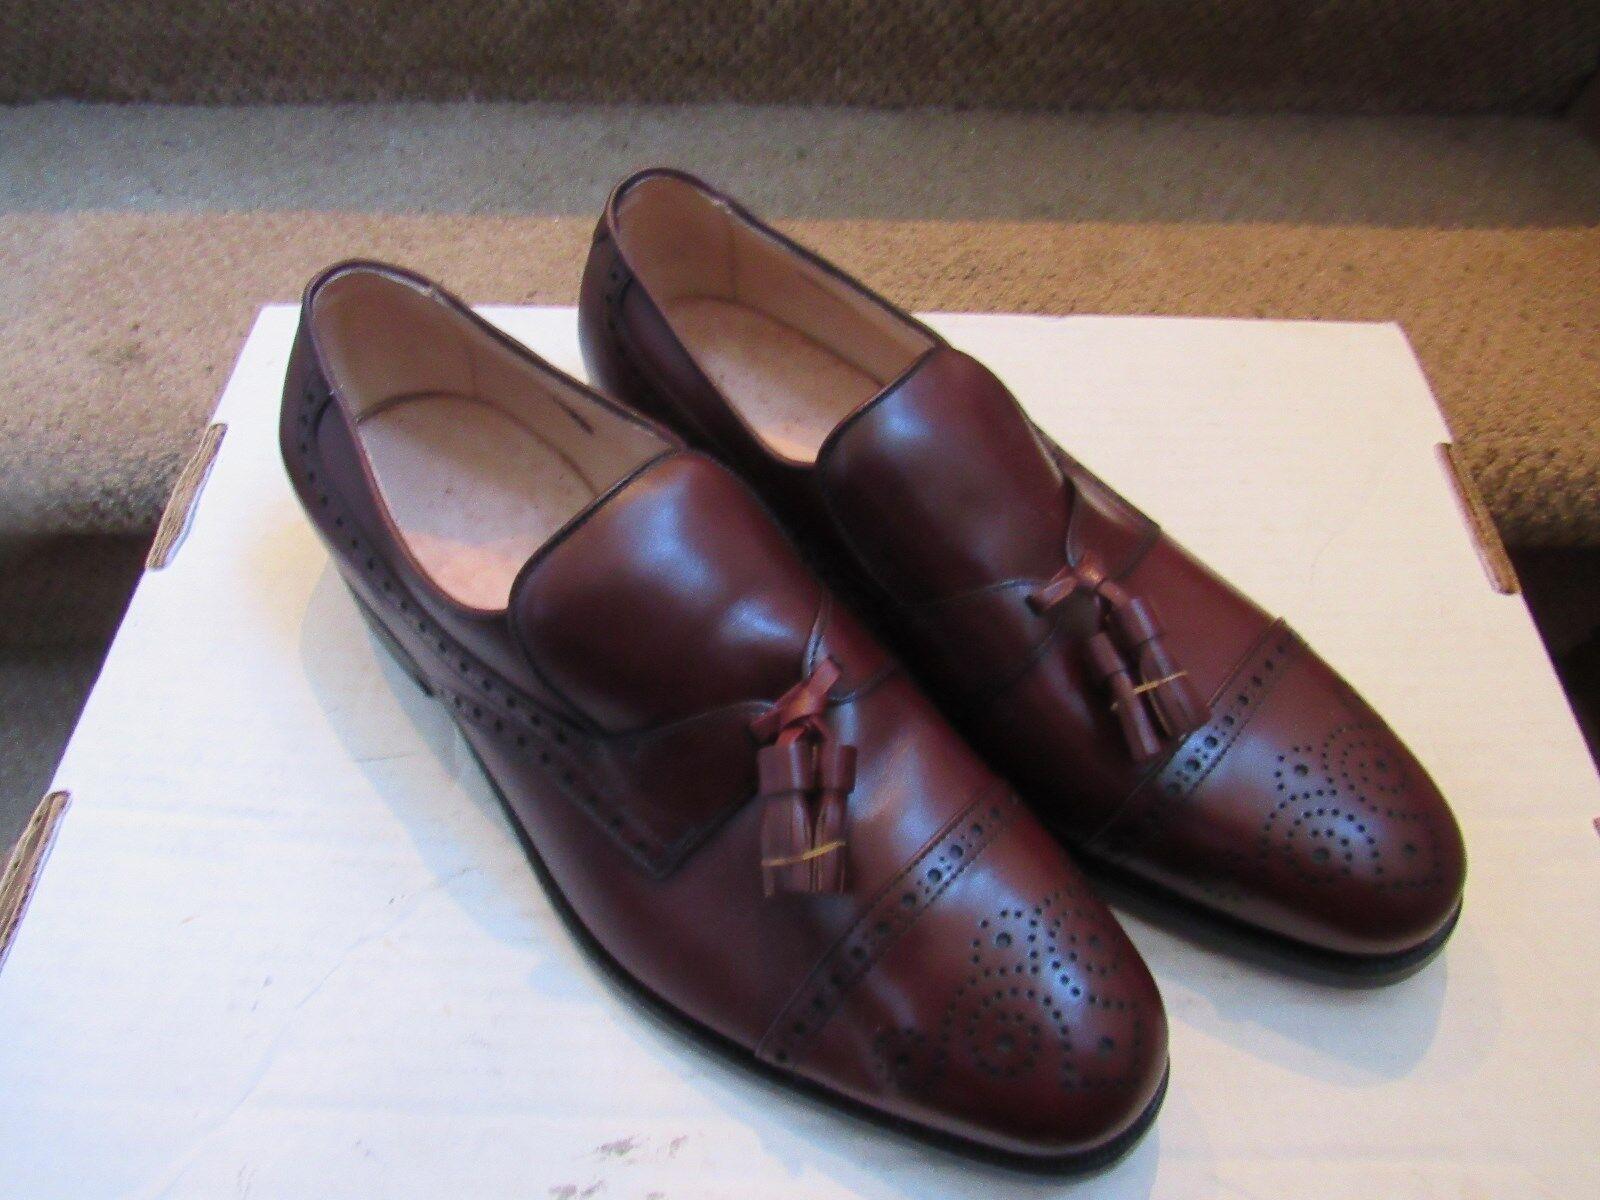 pair of  Allen Edmonds ROCKHURST Reddish color Loafers Size 8.5 C NWOB new